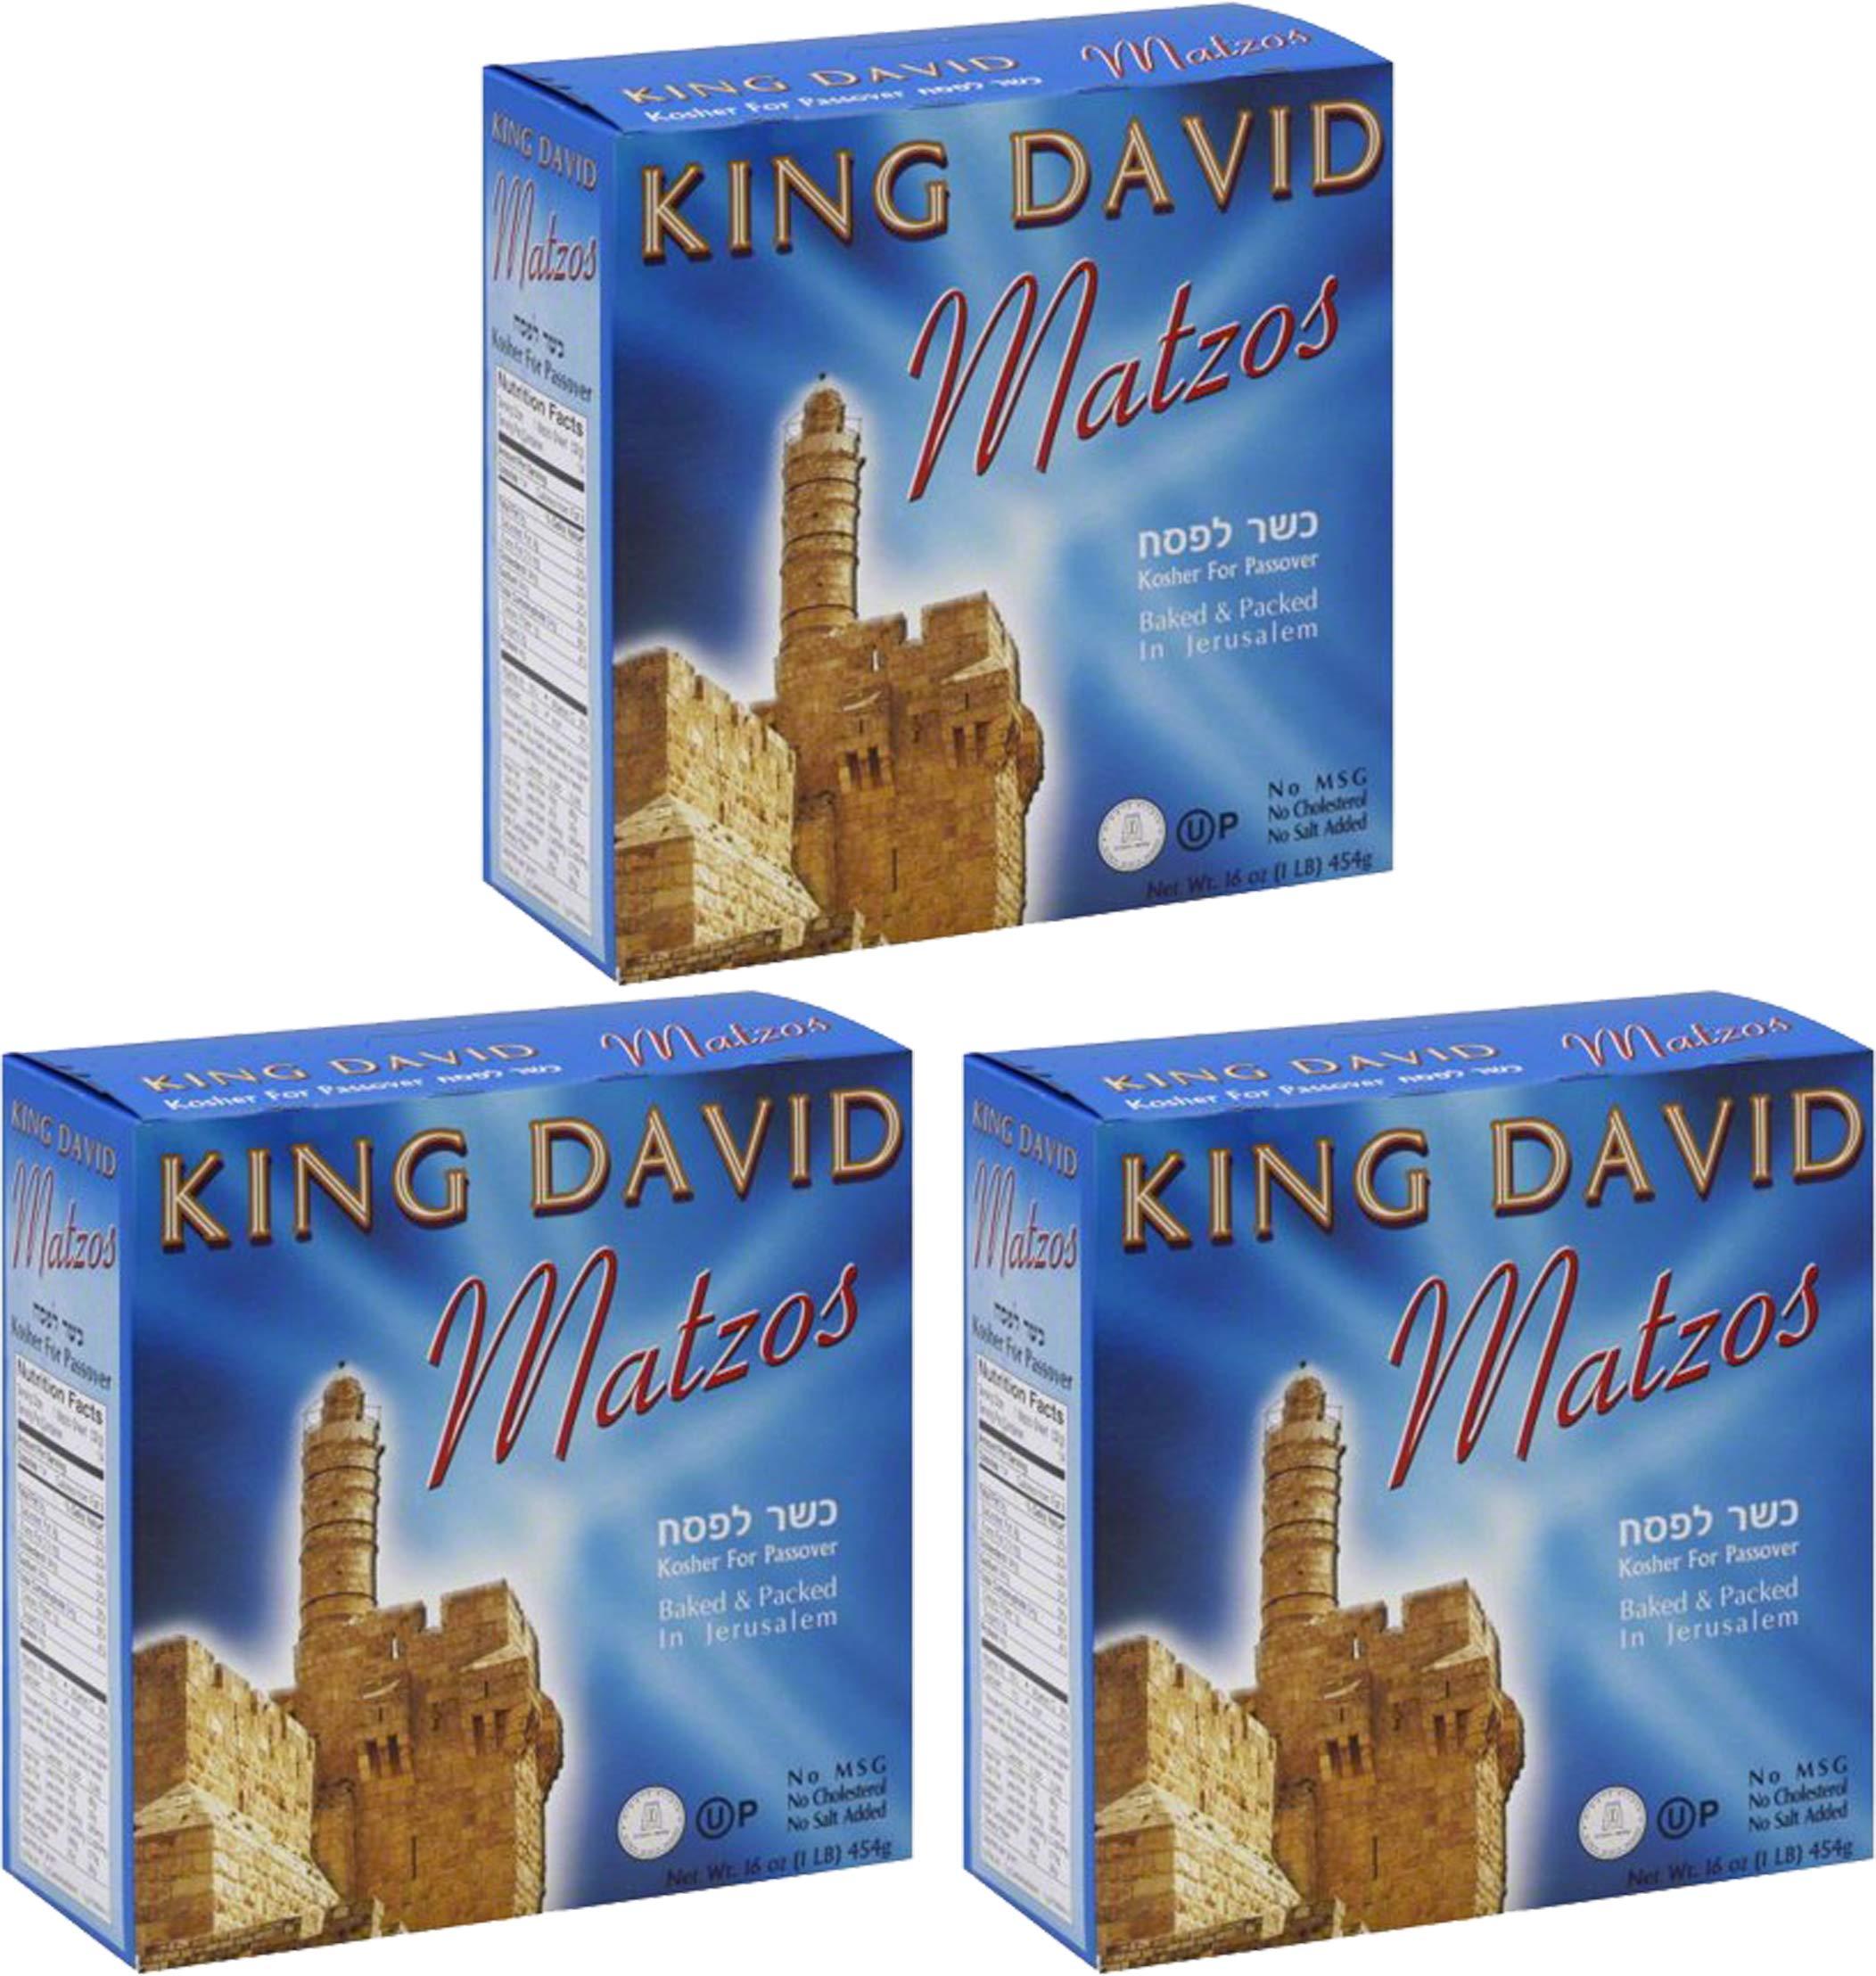 Matzo Passover Matzah Israeli Kosher For Passover King David Matzos Three Individual One Pound Boxes (Total of 3 LBS) by King David